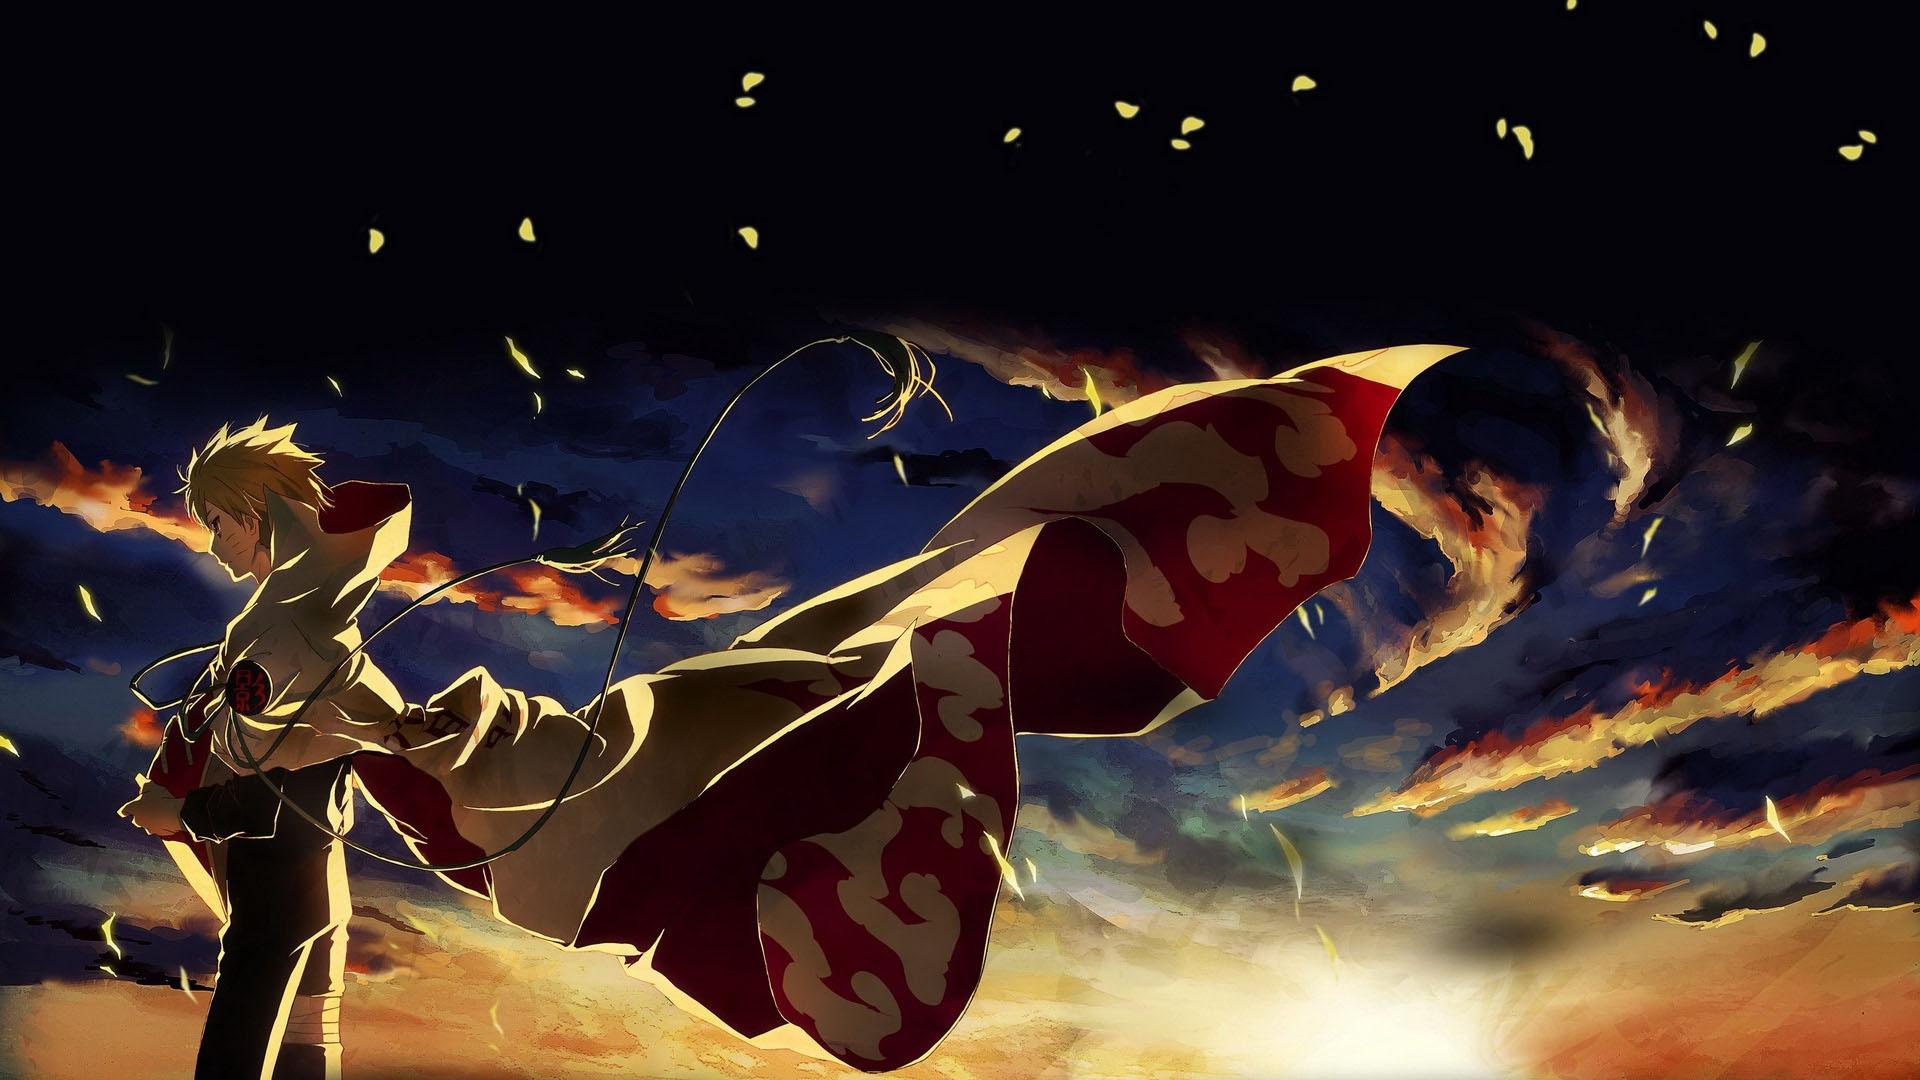 48 Anime Boy Wallpaper Hd On Wallpapersafari